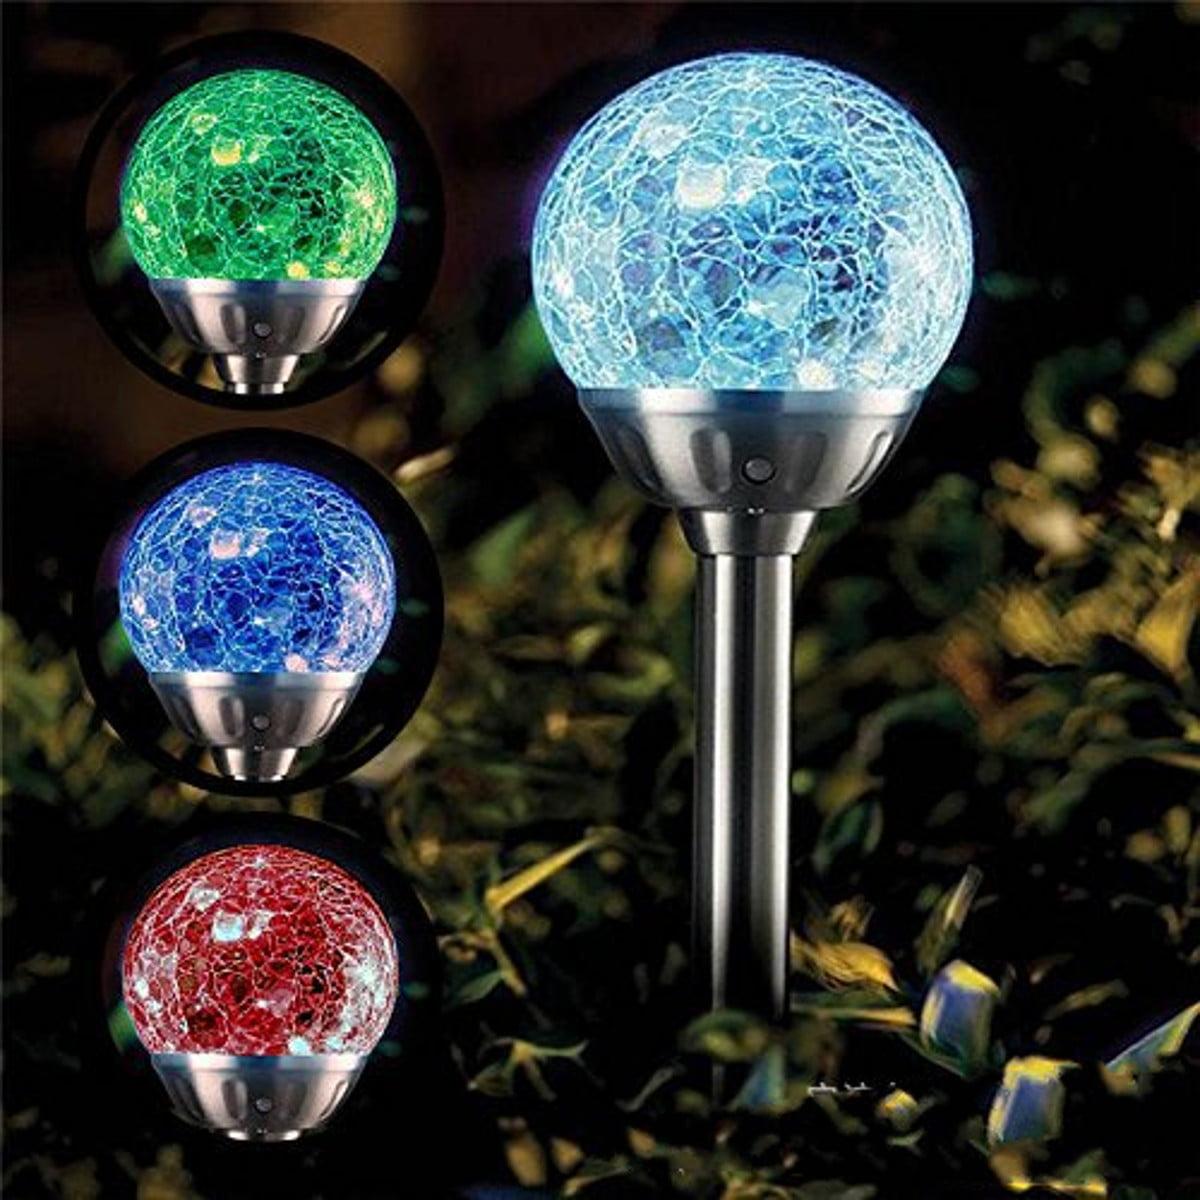 Solar Lights Outdoor Cracked Glass Ball Led Garden Lights